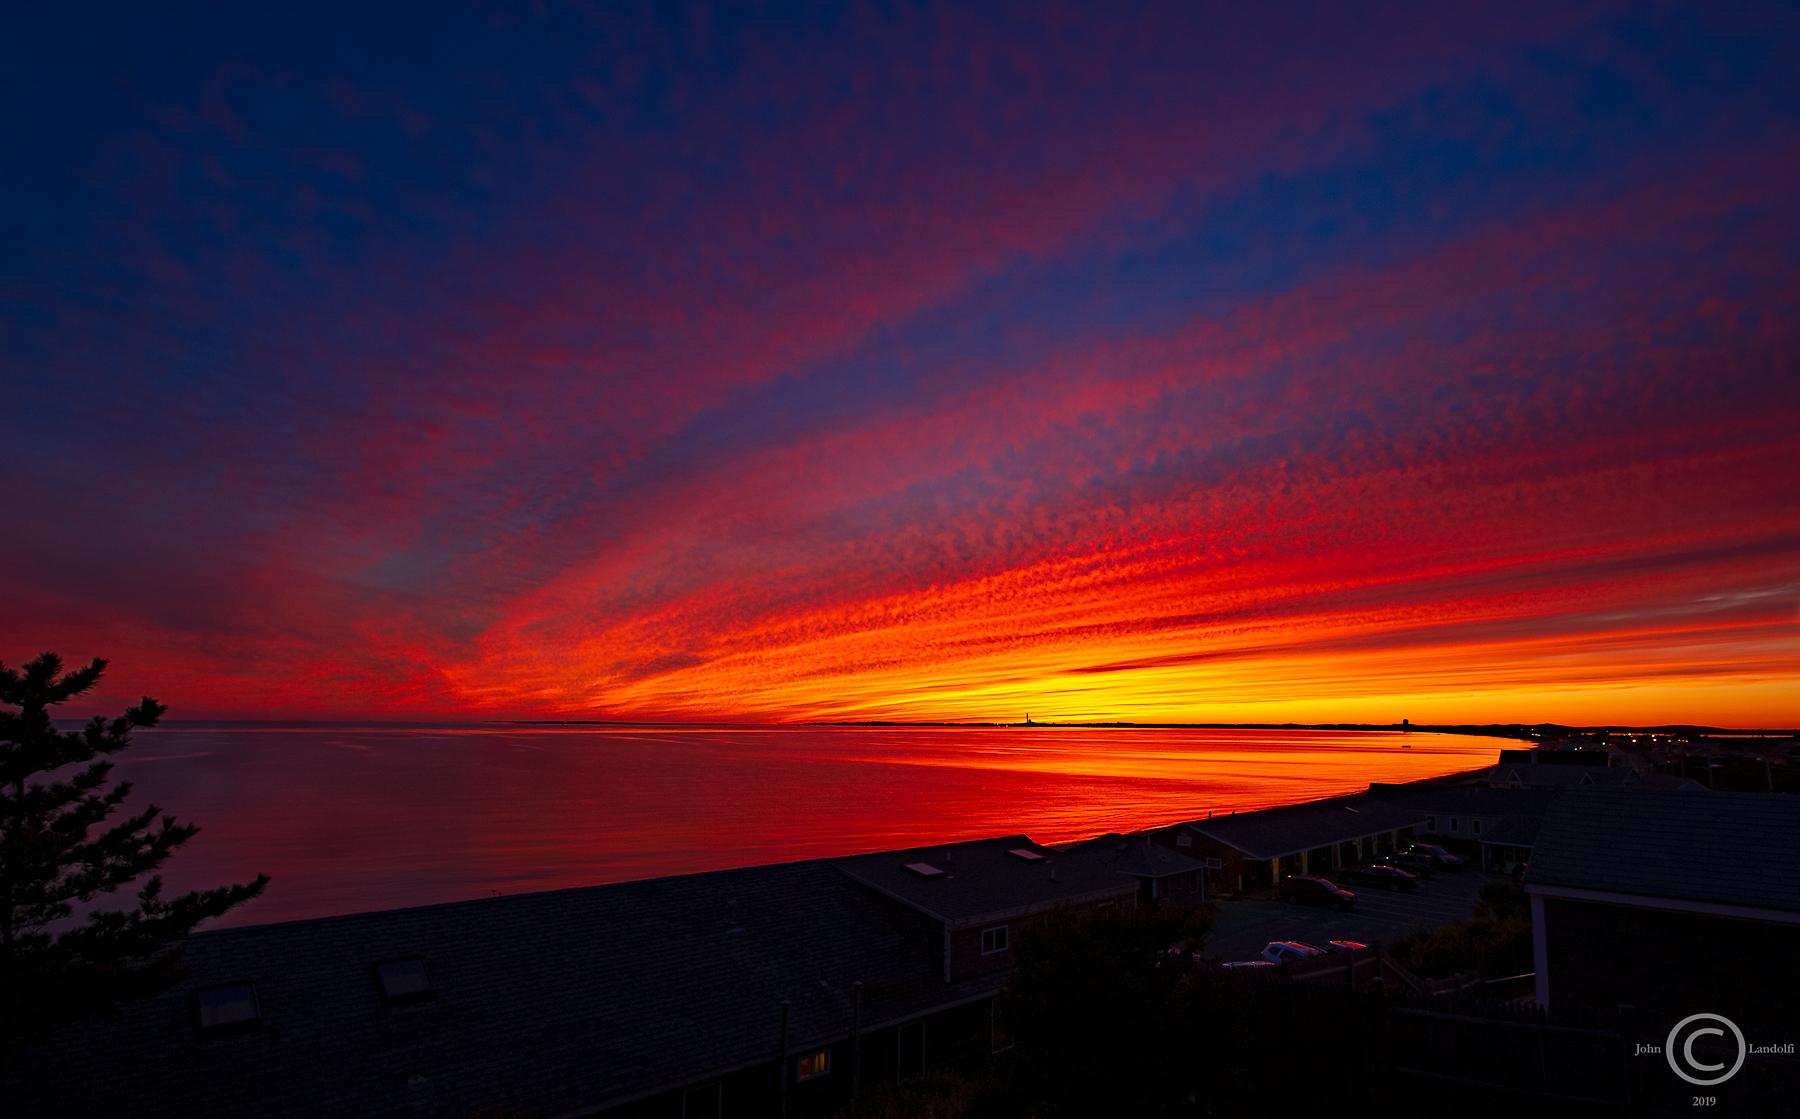 Cape-Cod-2019-Sunset-No5